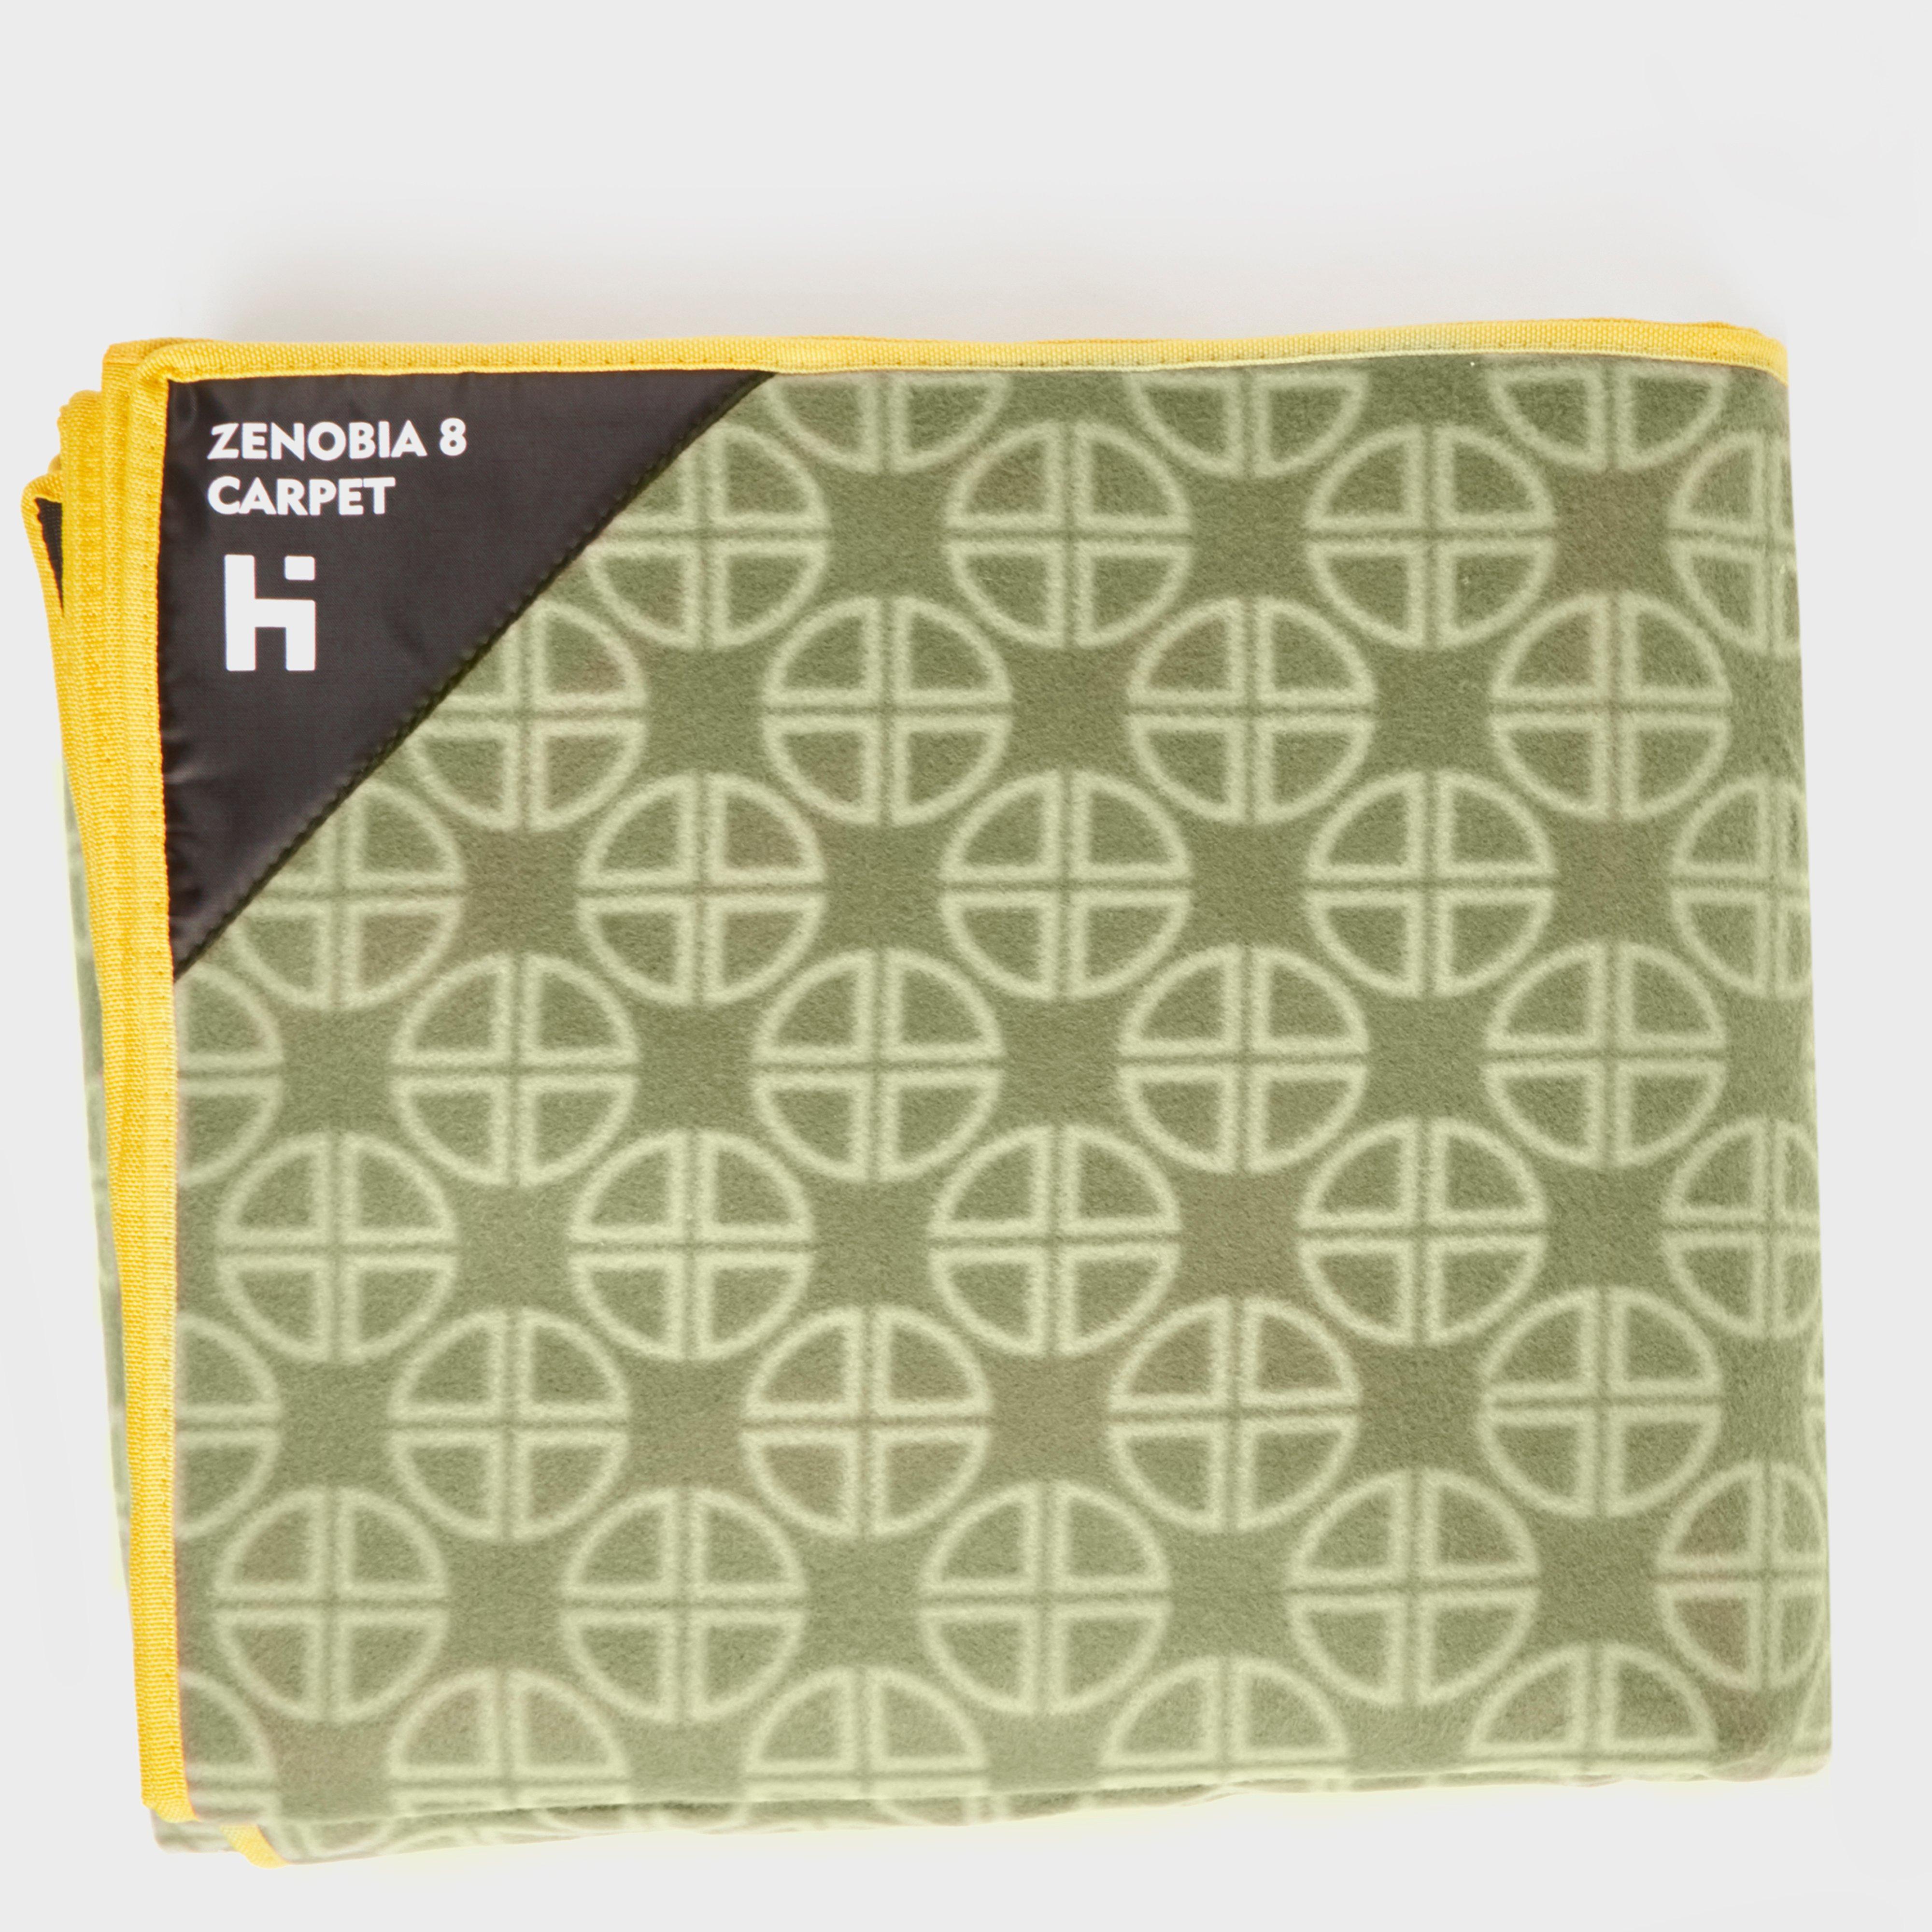 HI-GEAR Zenobia 8 Tent Carpet, Grey